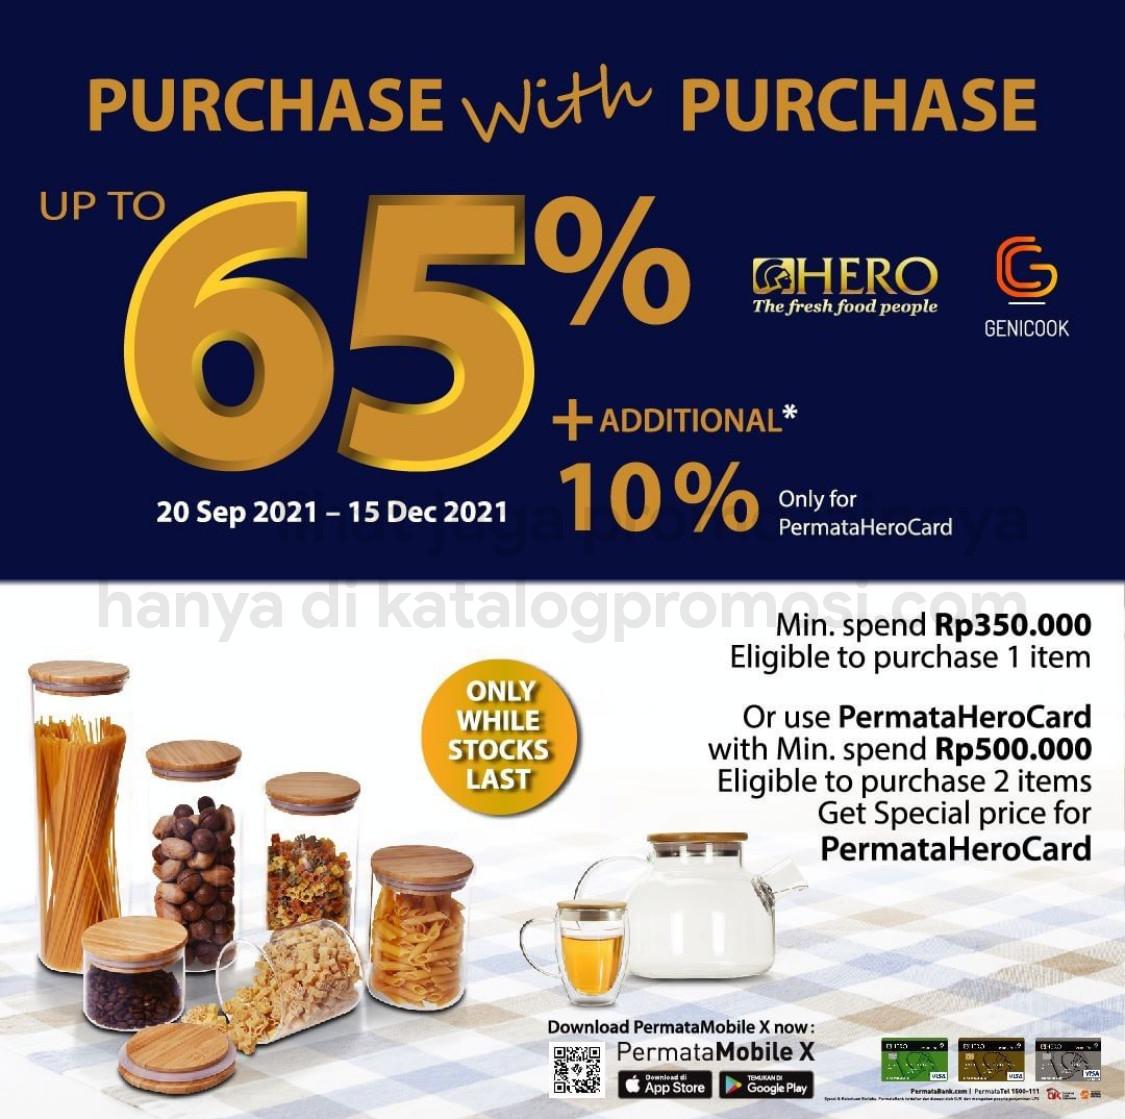 Promo HERO SUPERMARKET PURCHASE WITH PURCHASE - DISKON hingga 65% untuk GENICOOK Wooden Container